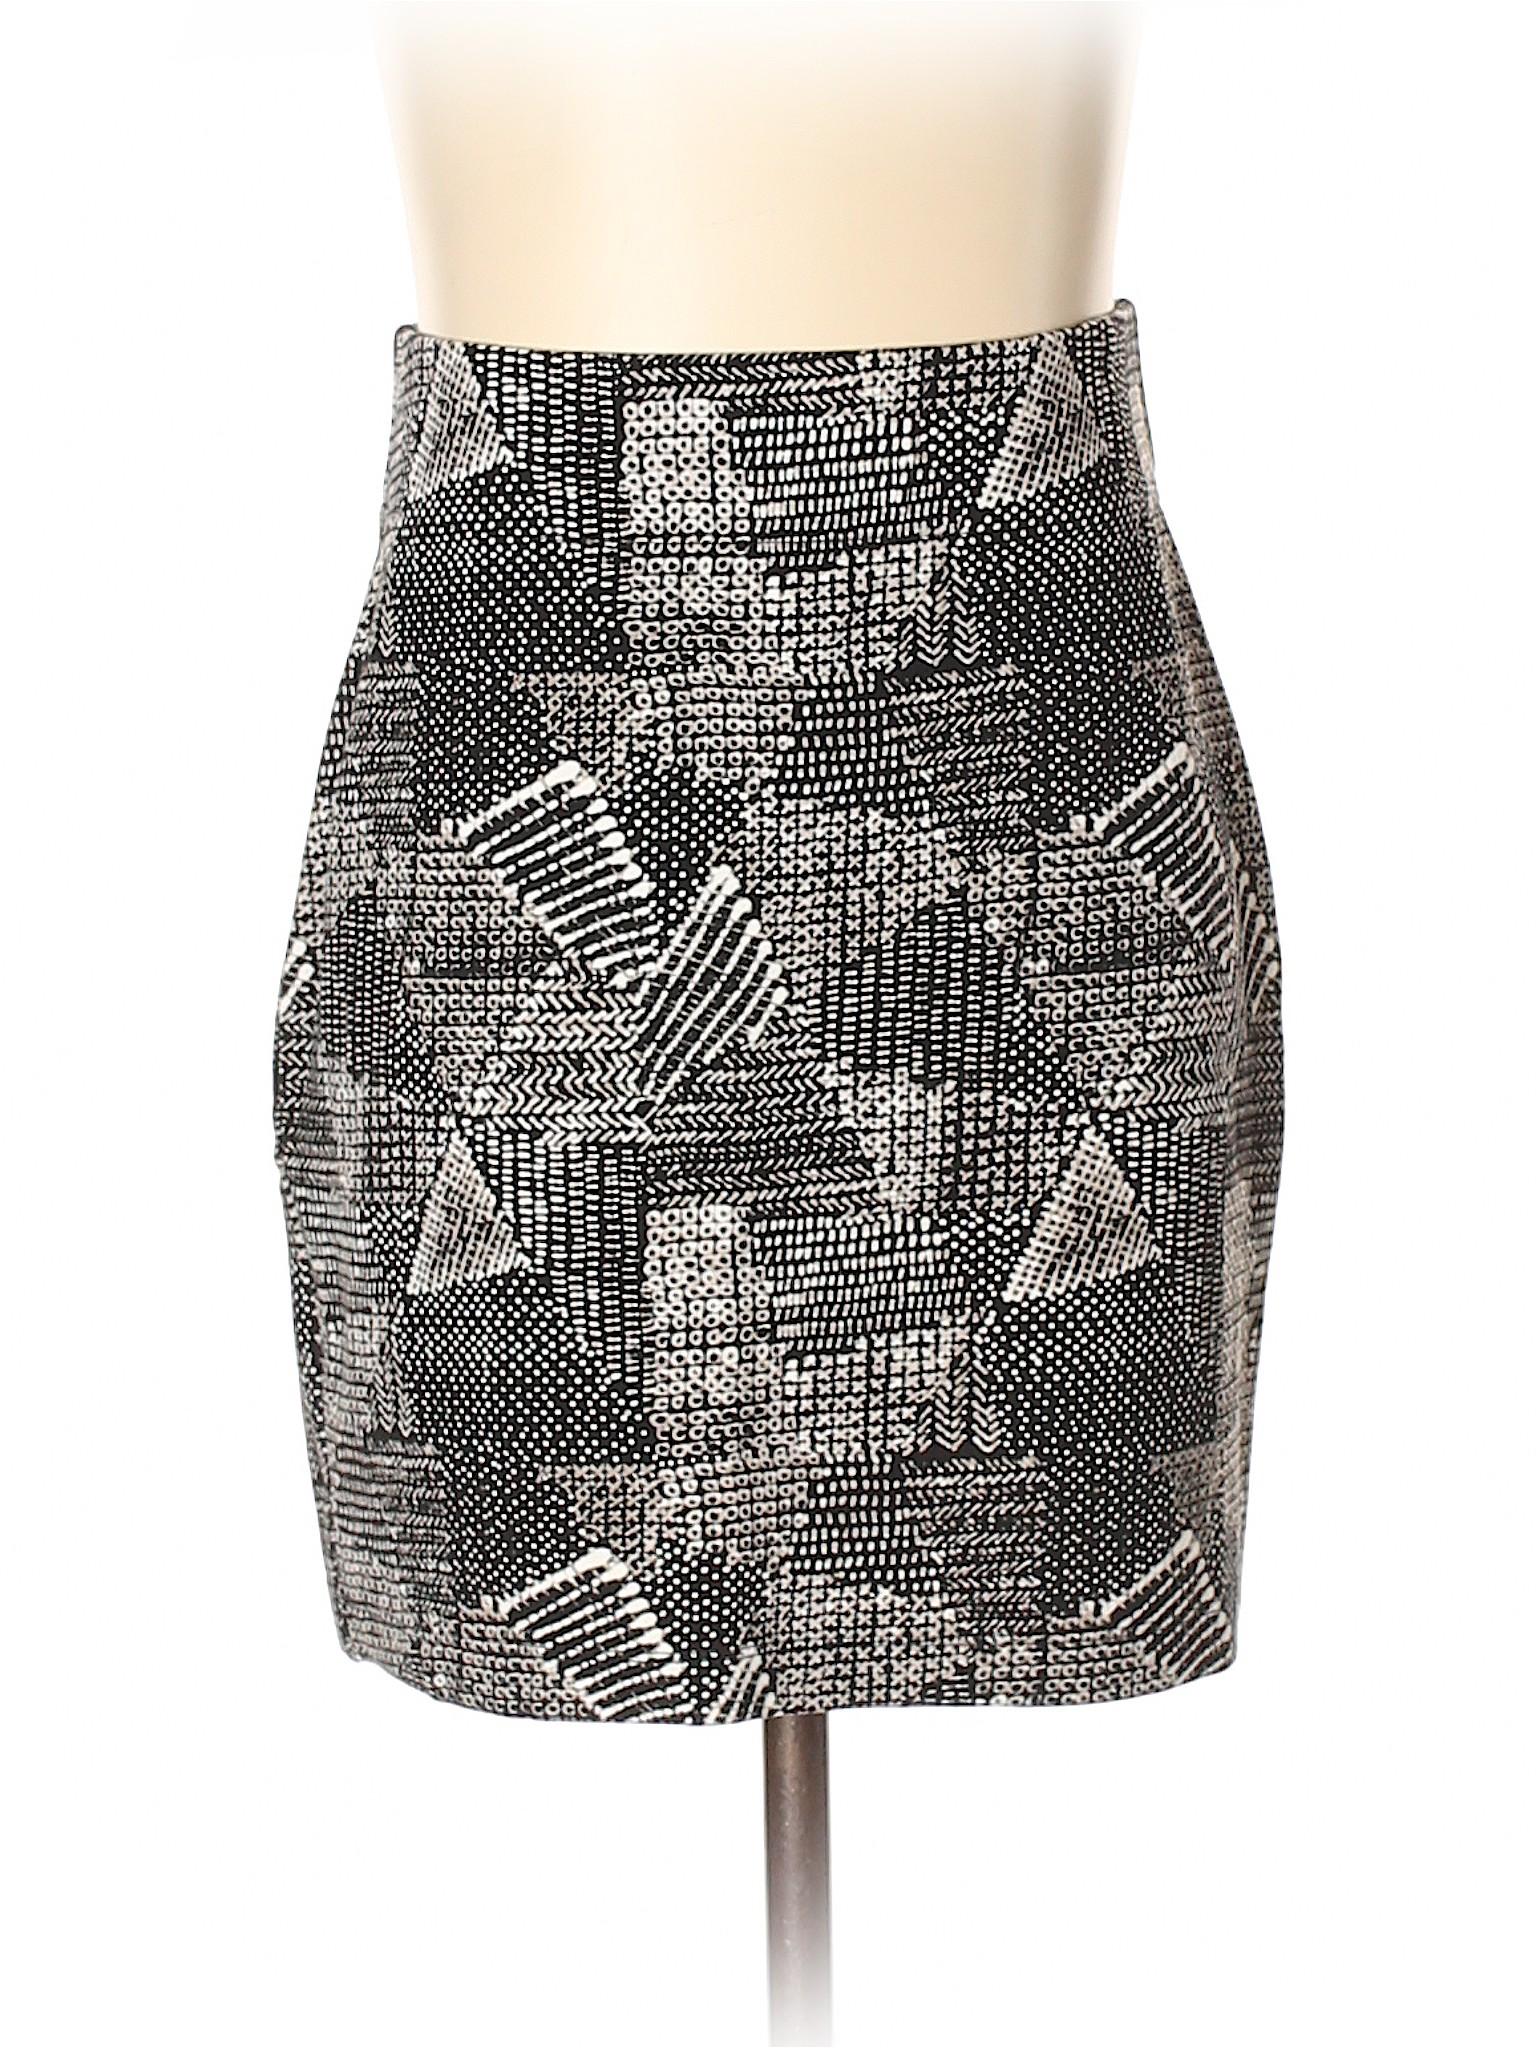 Skirt winter Madewell Leisure Leisure Leisure winter Casual Skirt Madewell Casual E5qd1q